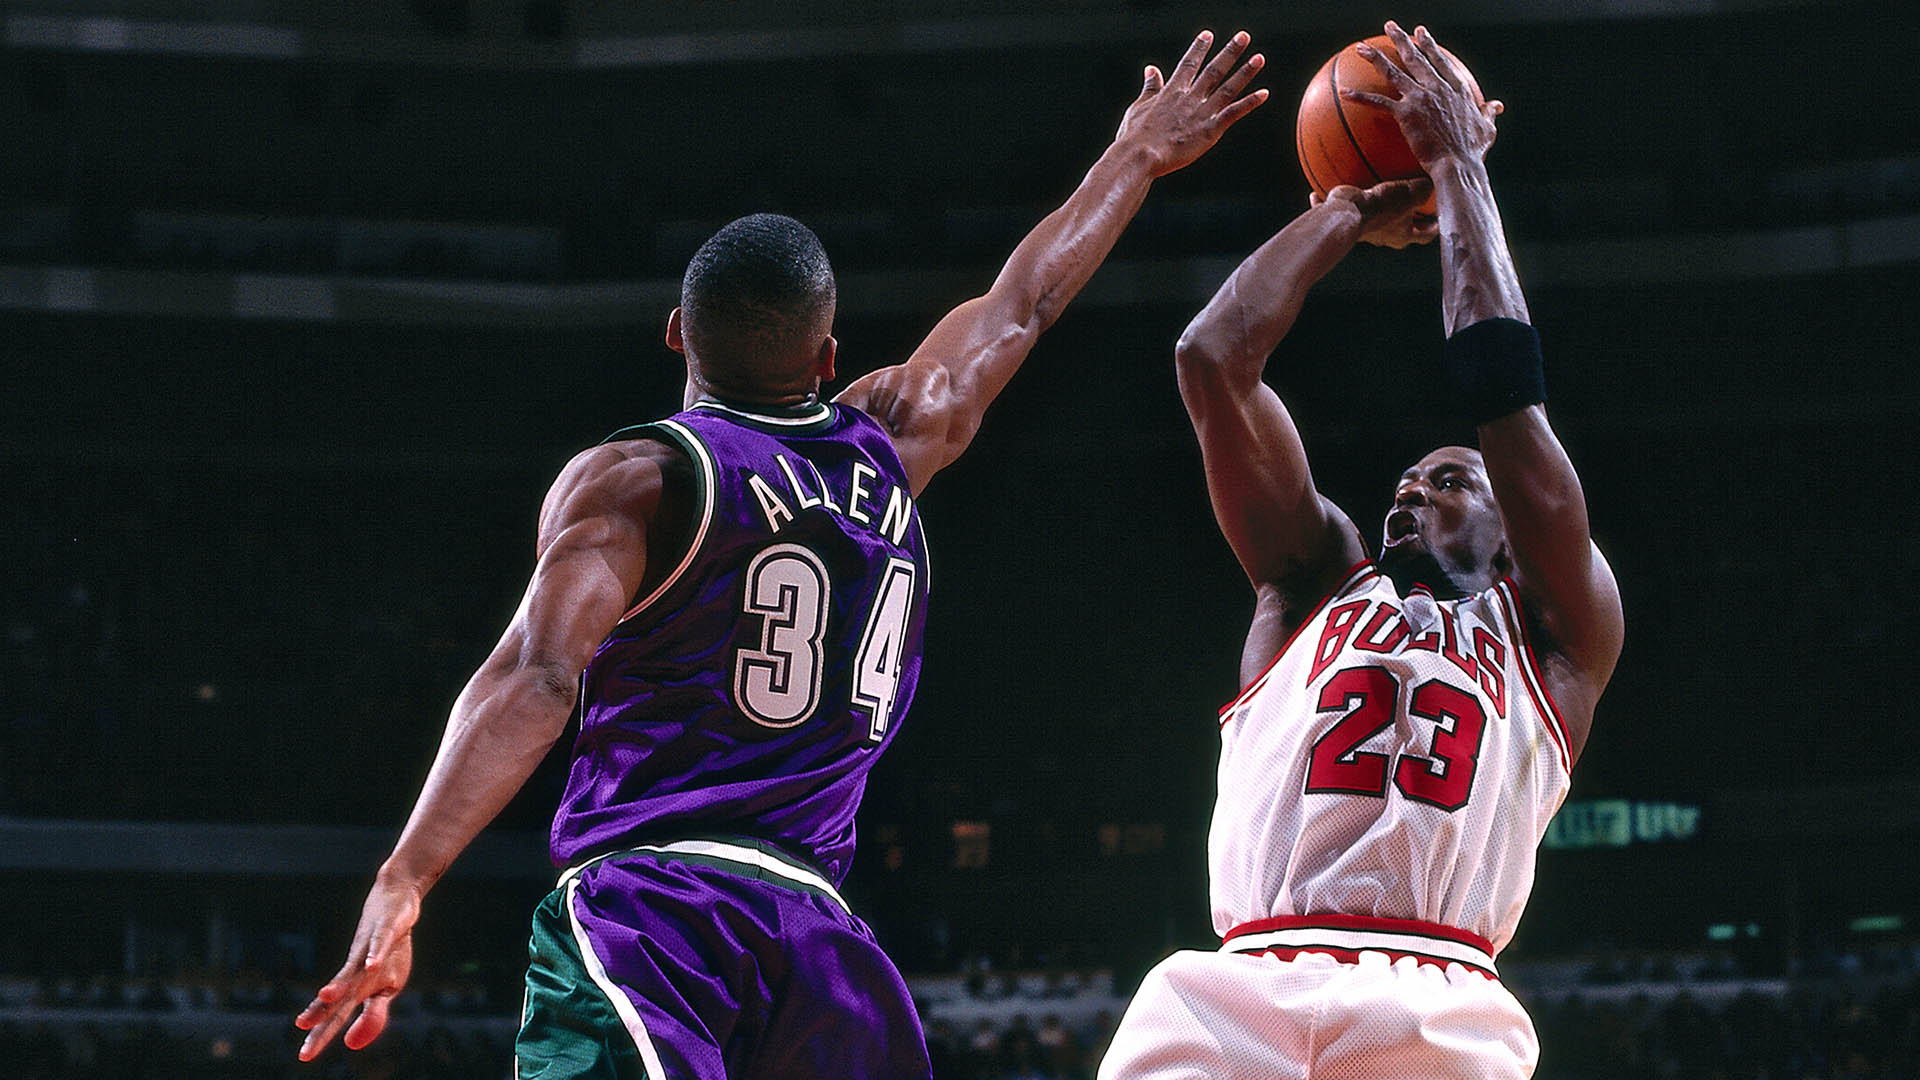 Michael Jordan's Signature Move: The Fadeaway